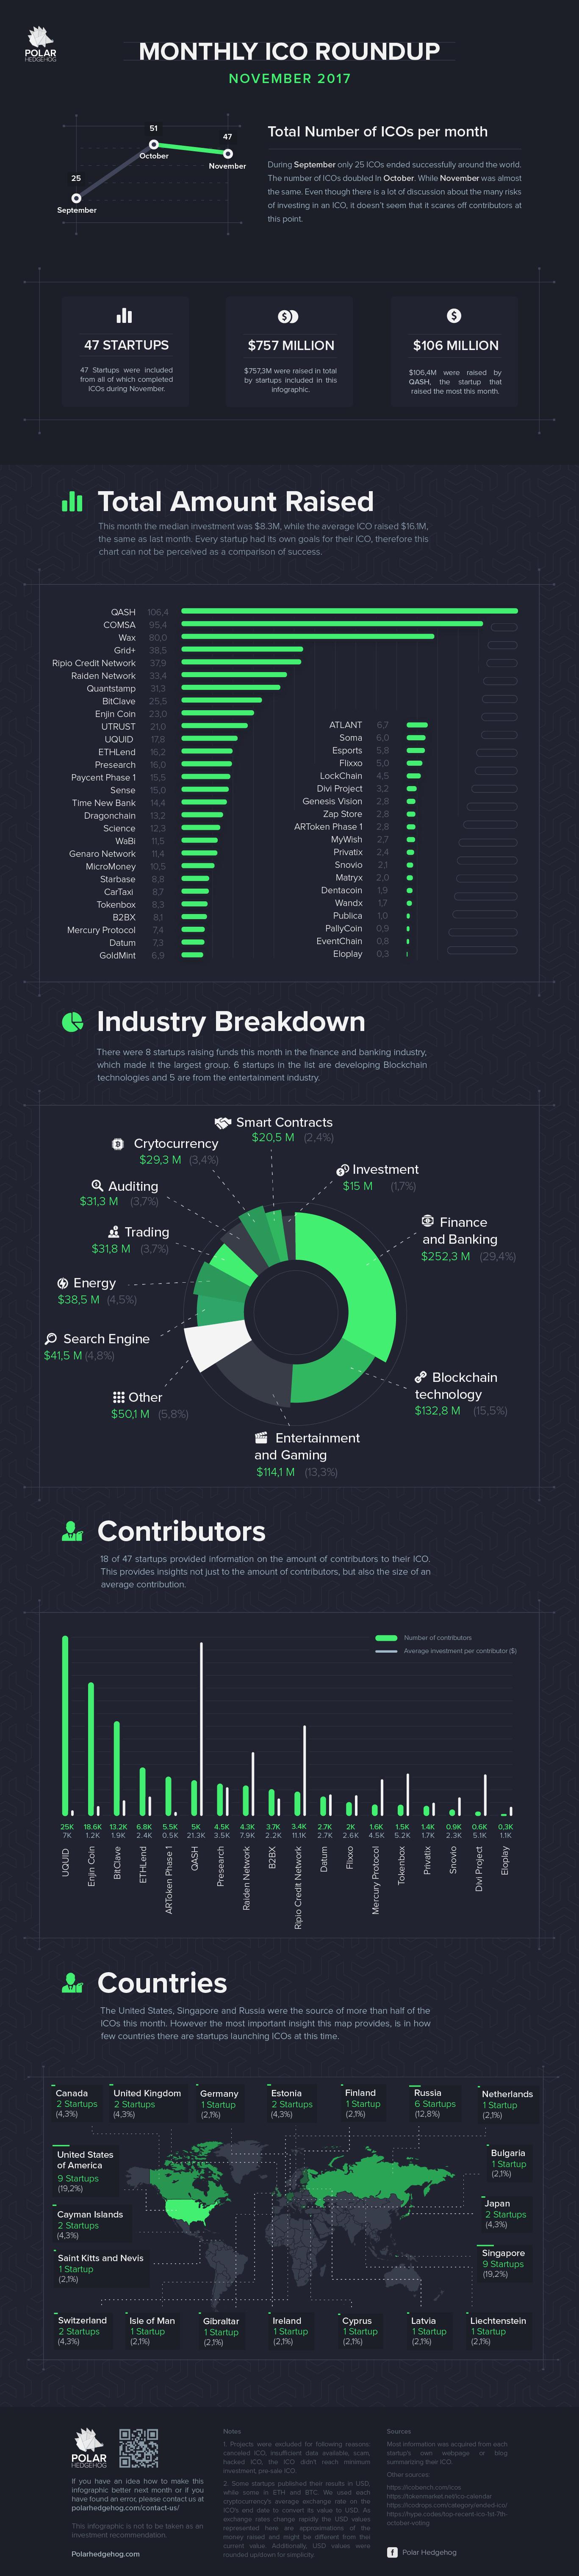 Polar Hedgehog - ICO Roundup Infographic - November 2017.png